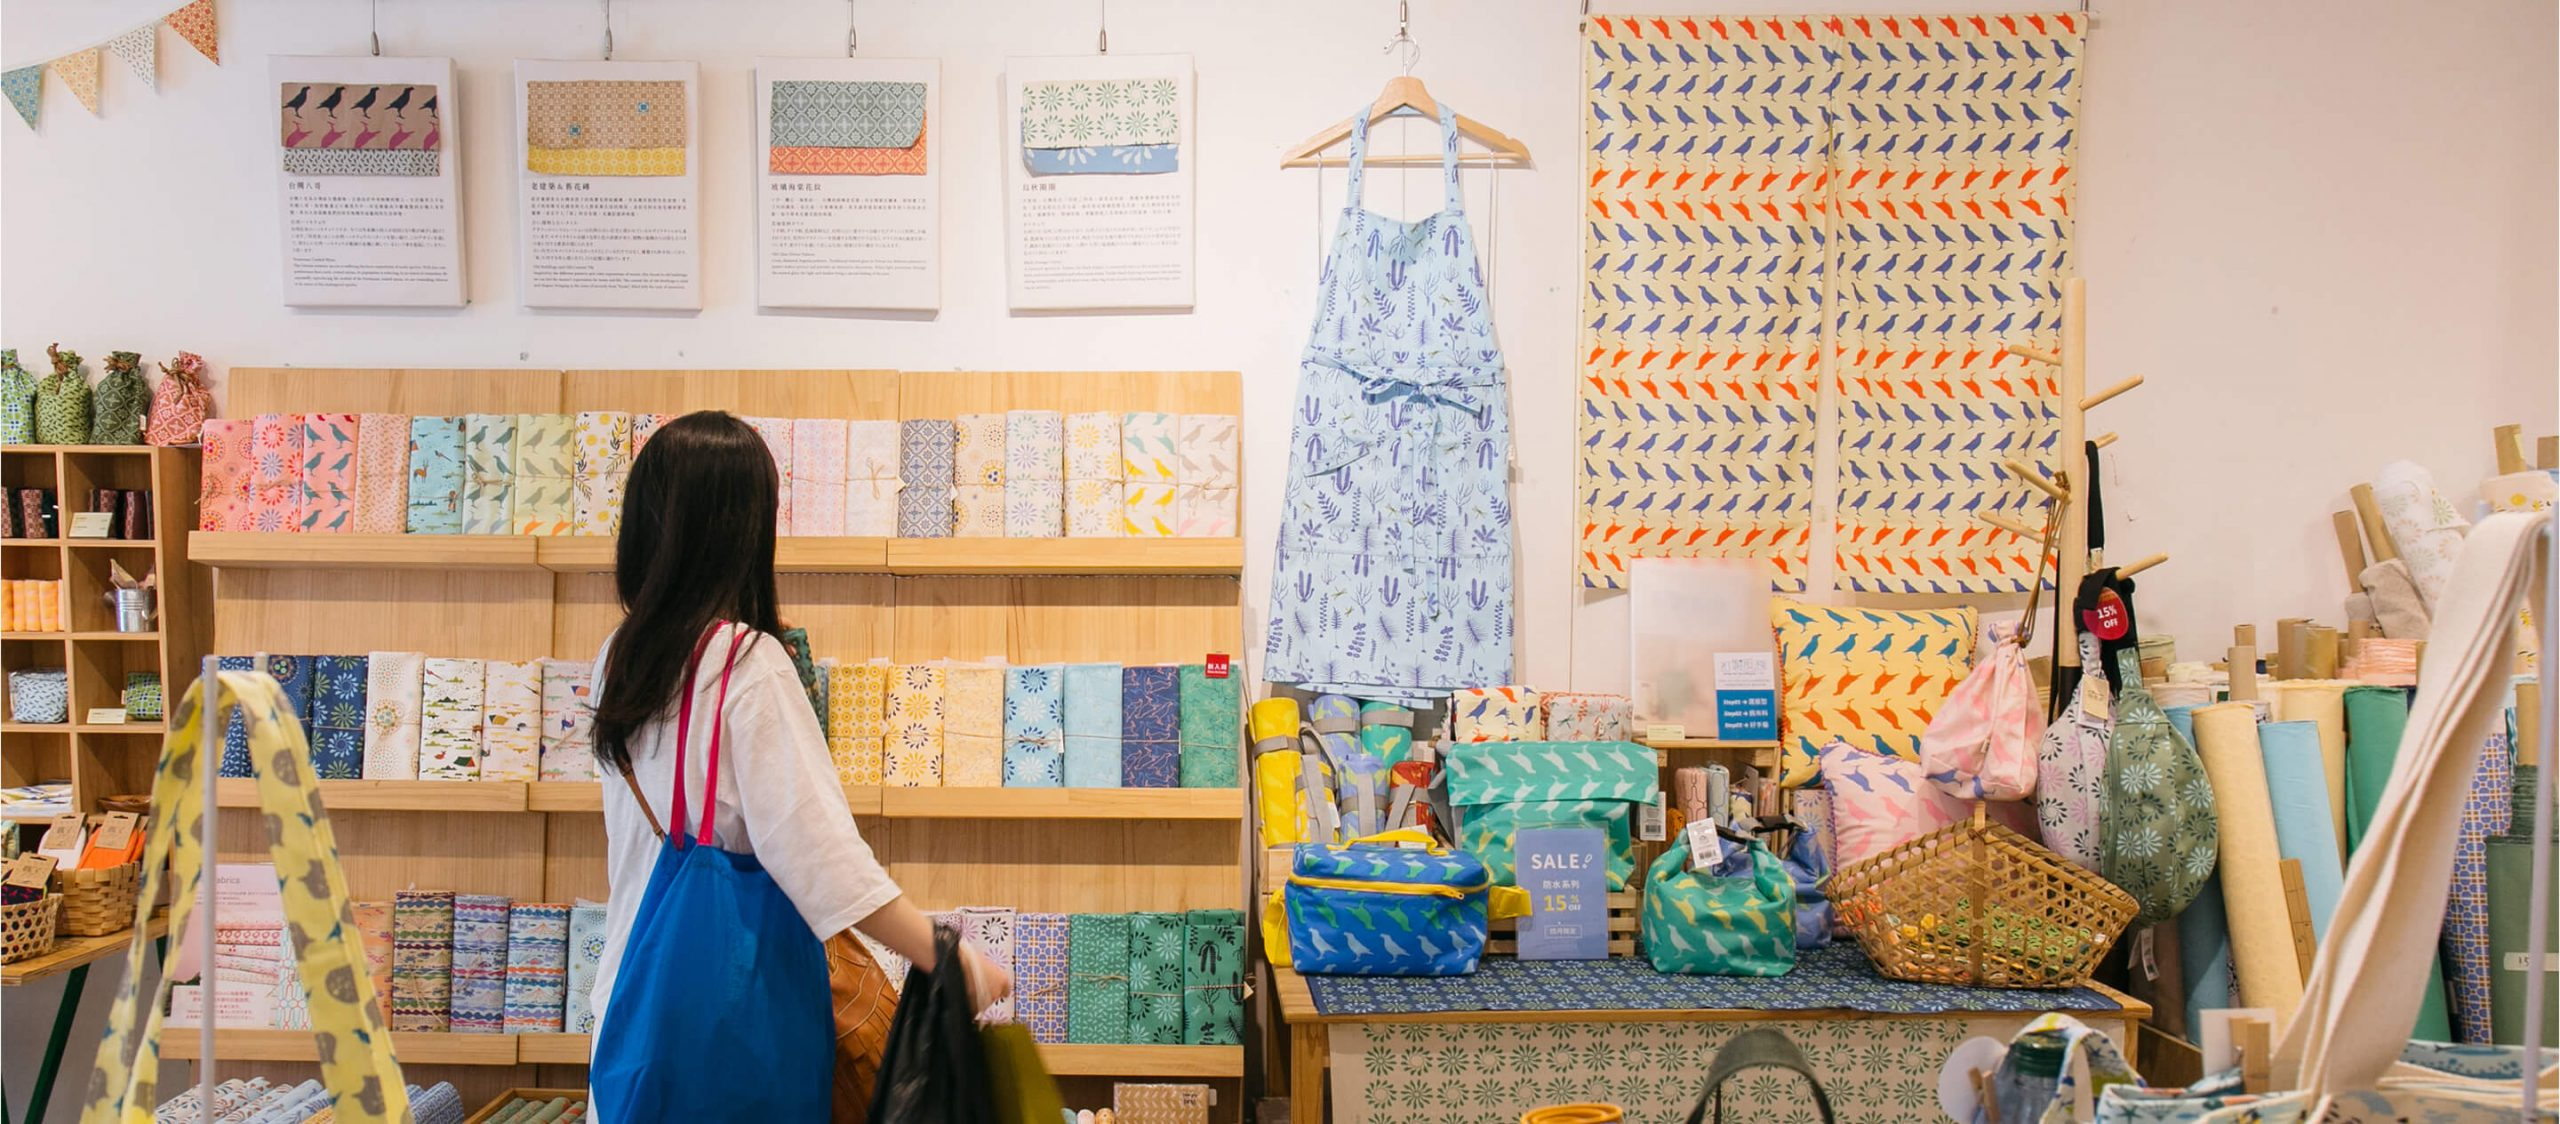 in Blooom : แบรนด์ผ้าพิมพ์แบรนด์แรกของไต้หวันที่เบ่งบานท่ามกลางย่านขายผ้าเก่าของไทเป